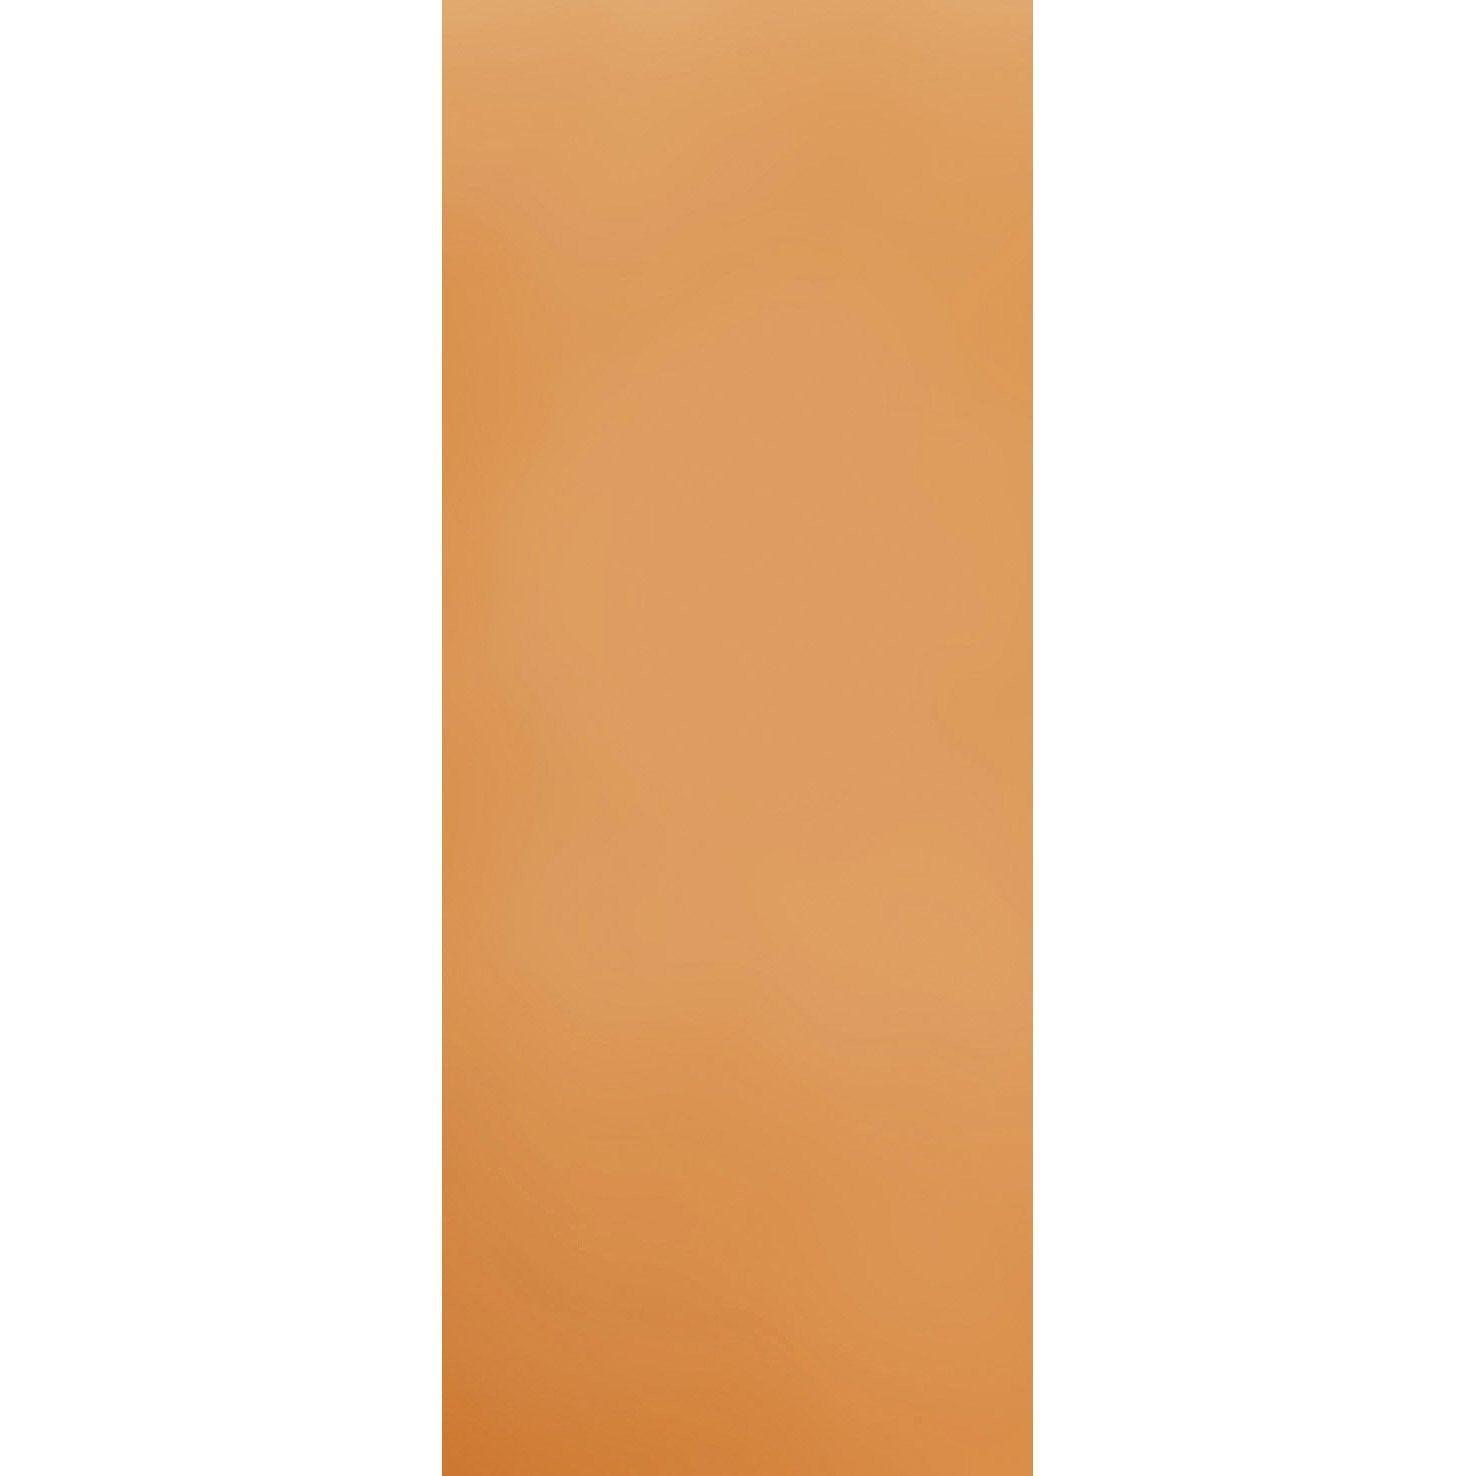 fa ence mur orange orange n 5 loft x cm leroy merlin. Black Bedroom Furniture Sets. Home Design Ideas